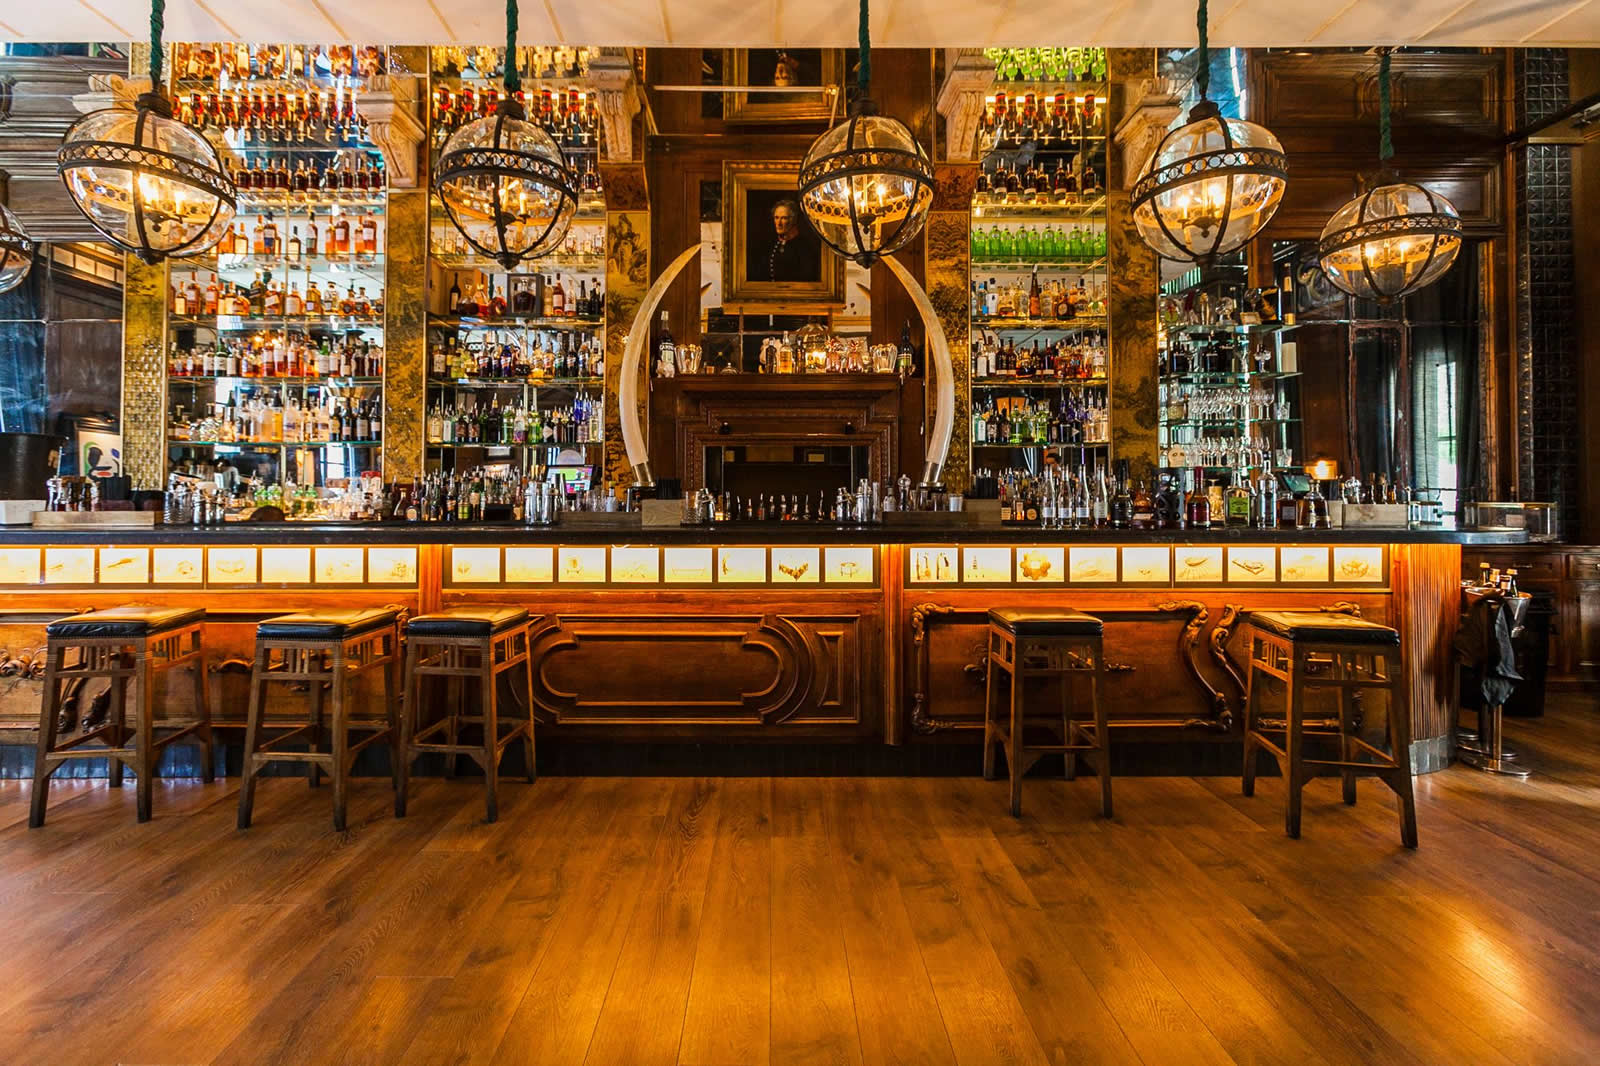 boca-chica-bar-cocktails-sergio-padilla.jpg